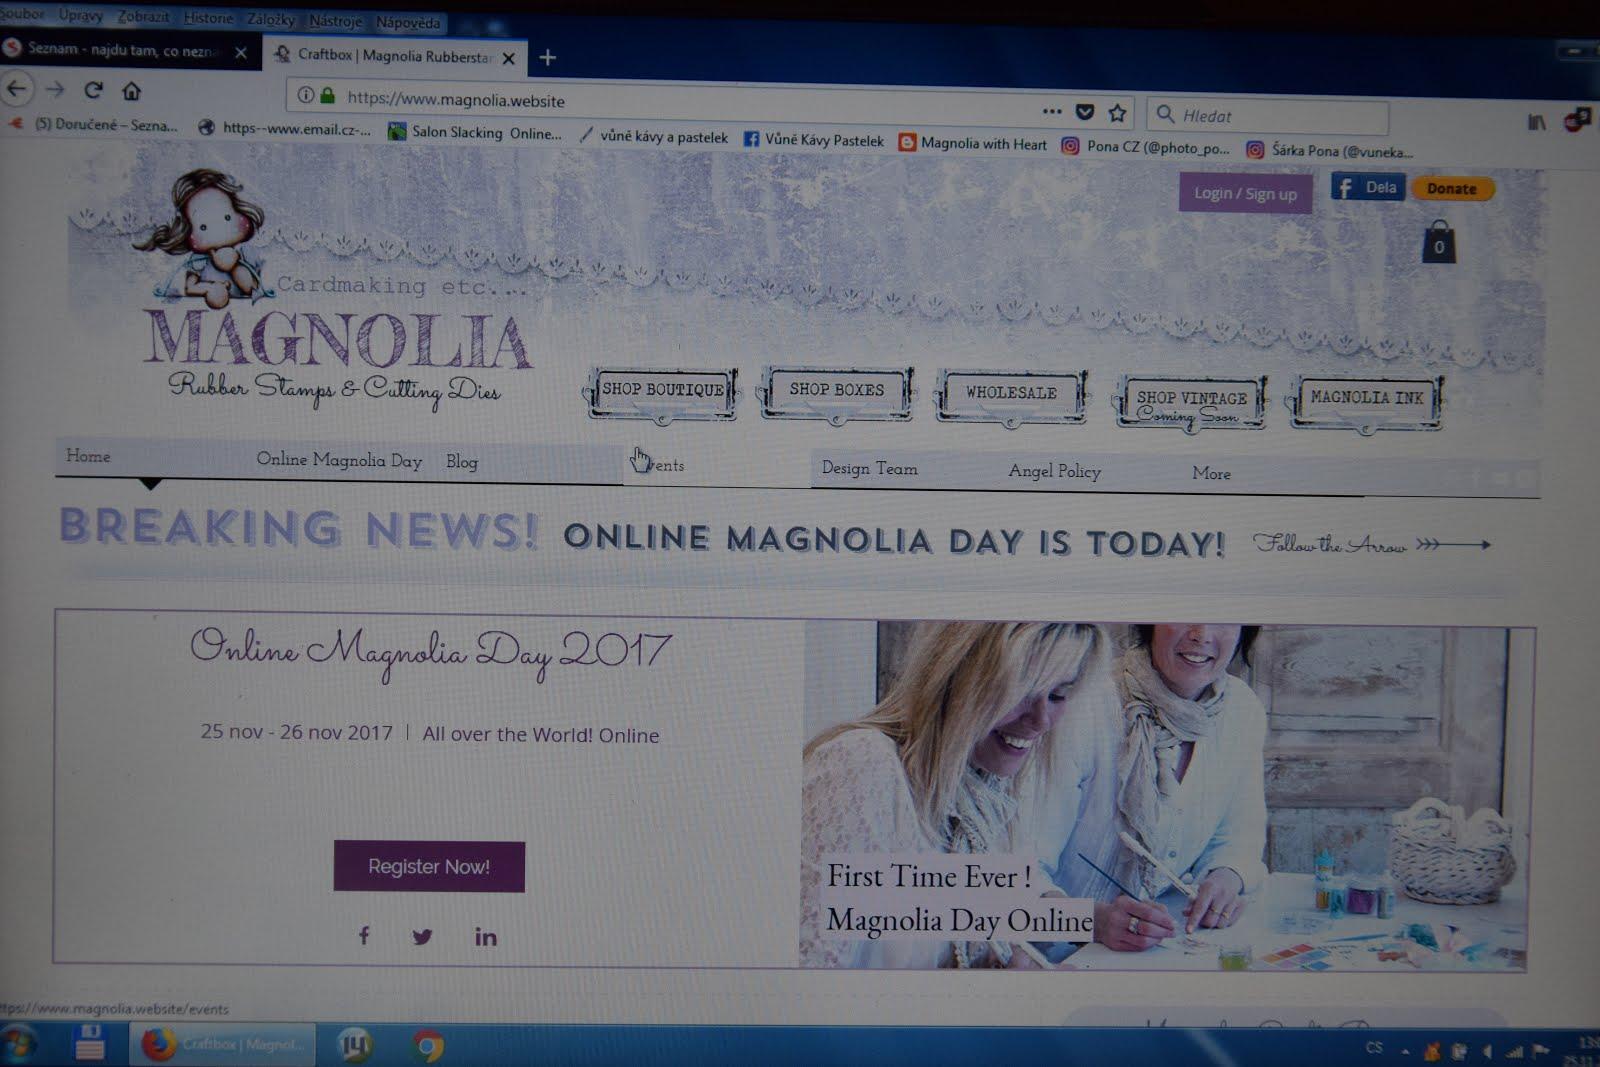 Online Magnolia Day 2017